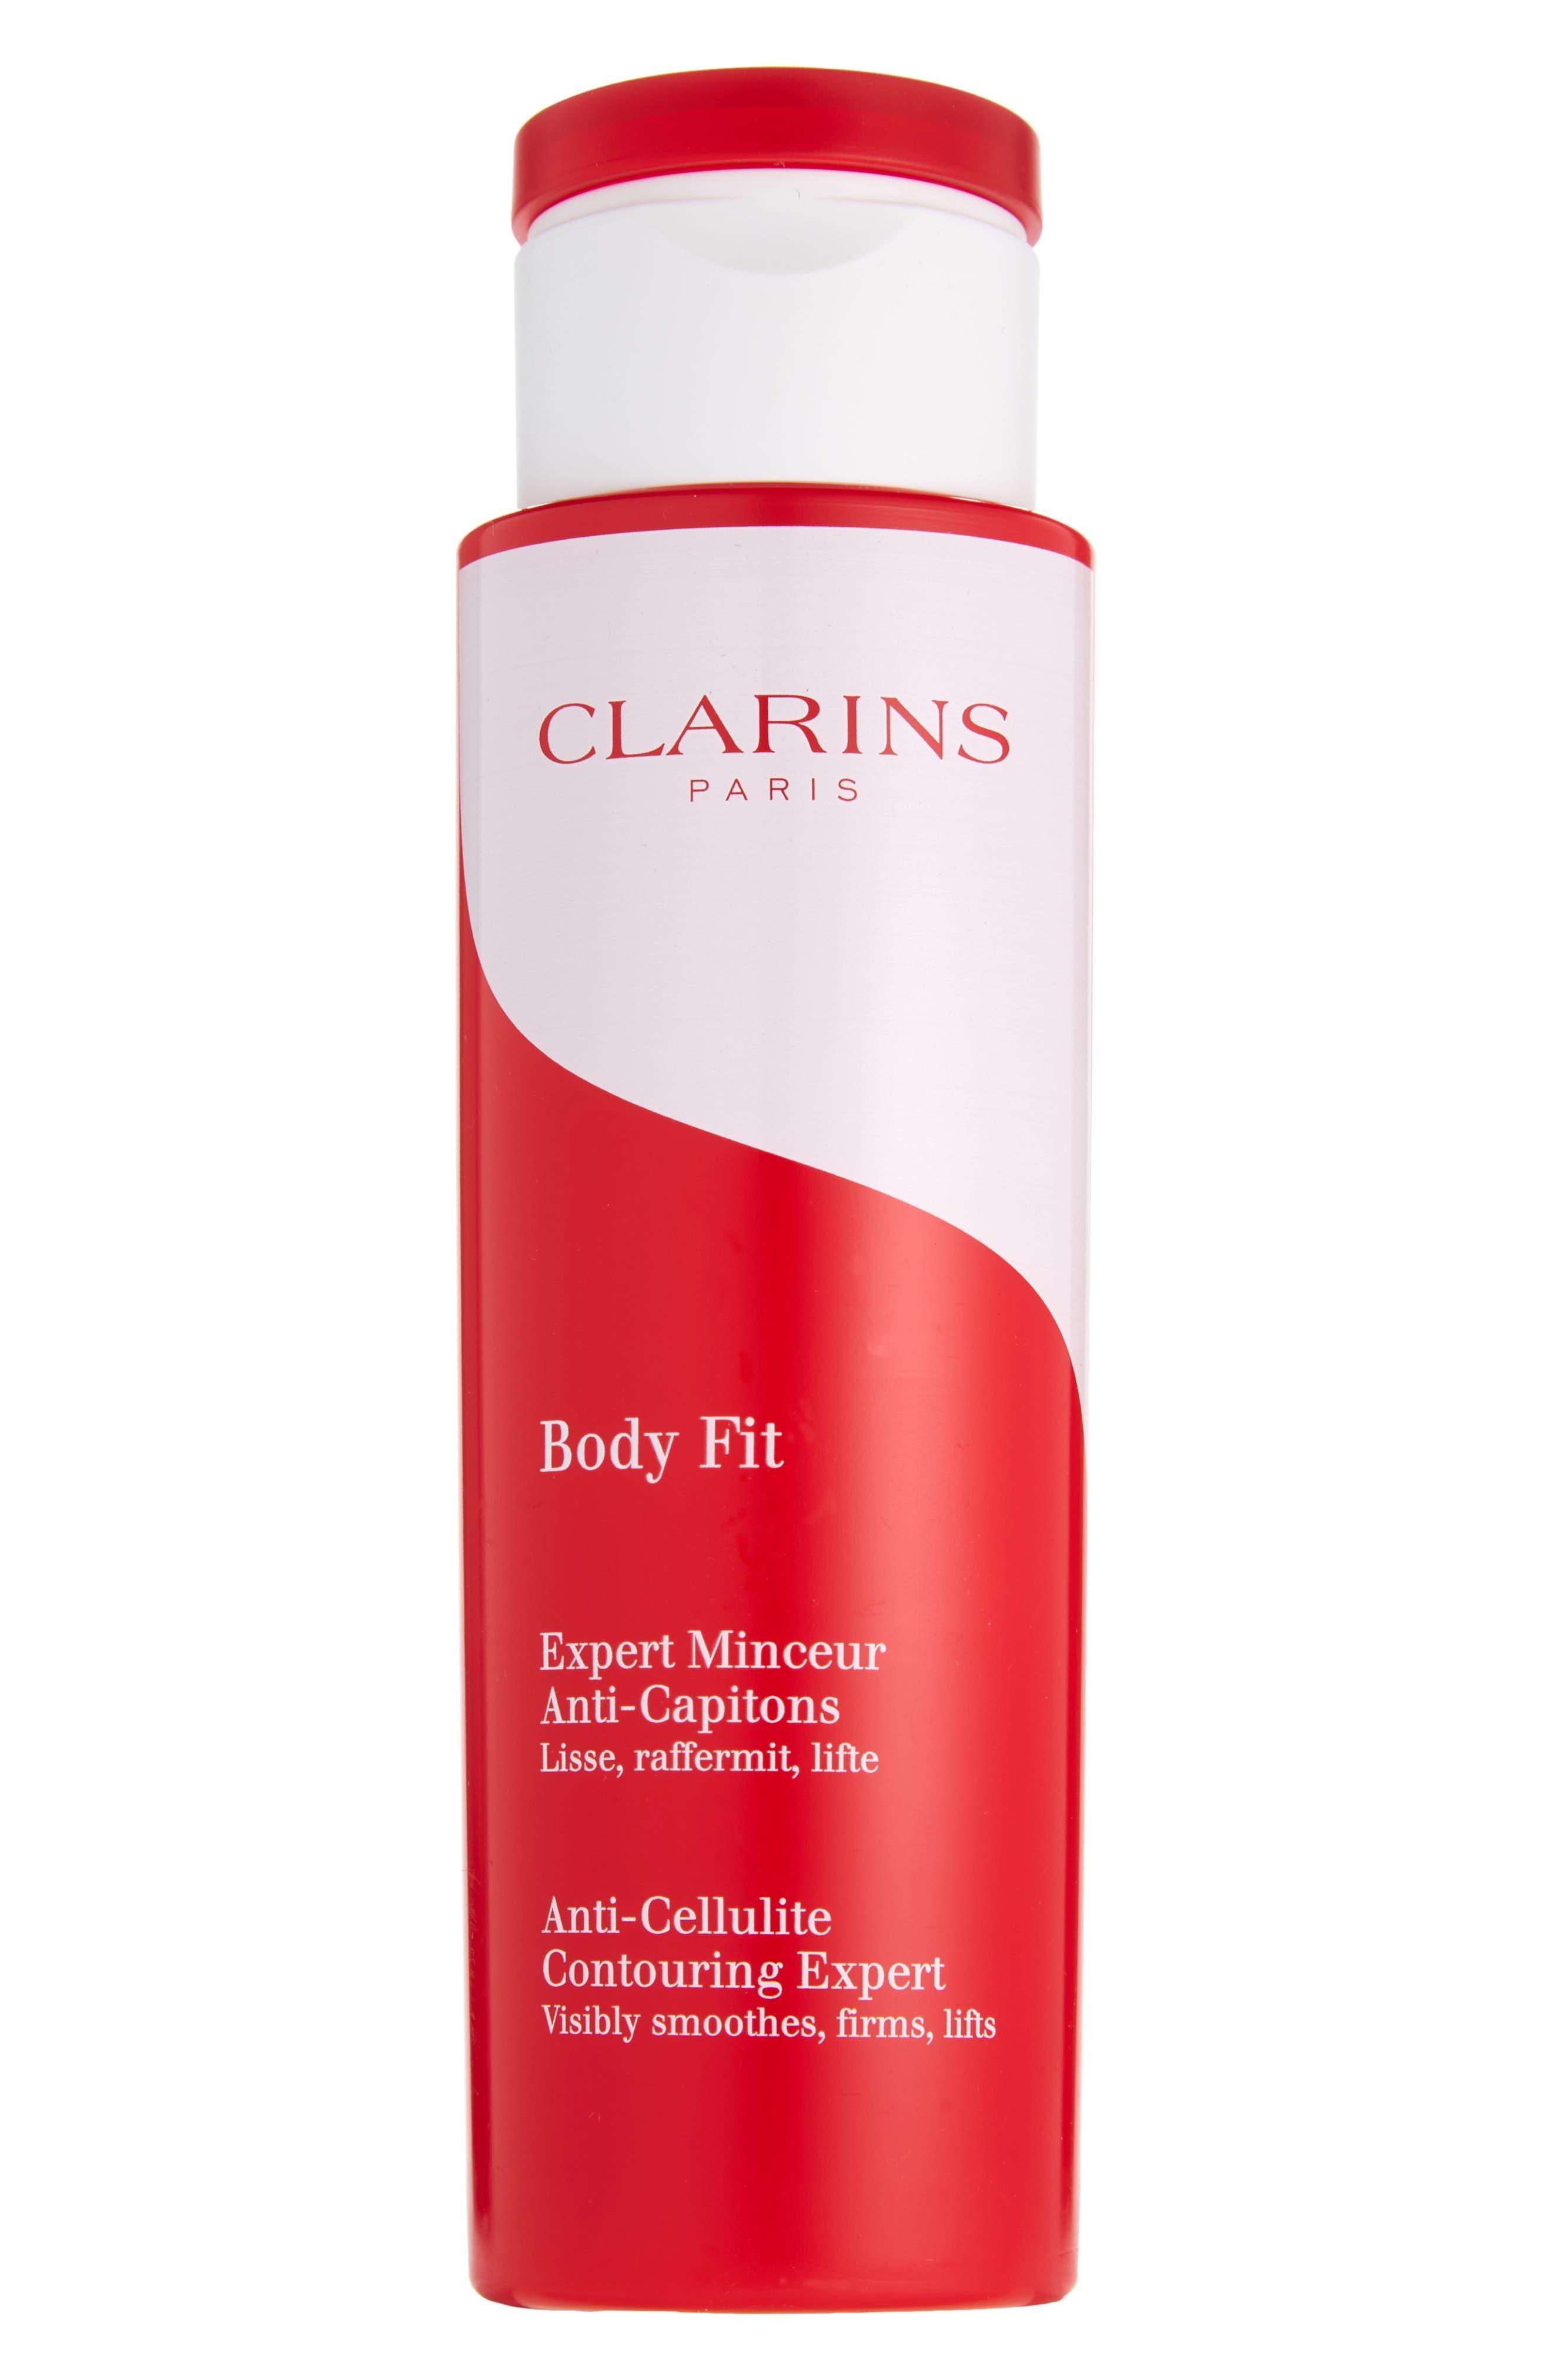 Body Fit Anti-Cellulite Contouring Expert Cream-Gel | Nordstrom